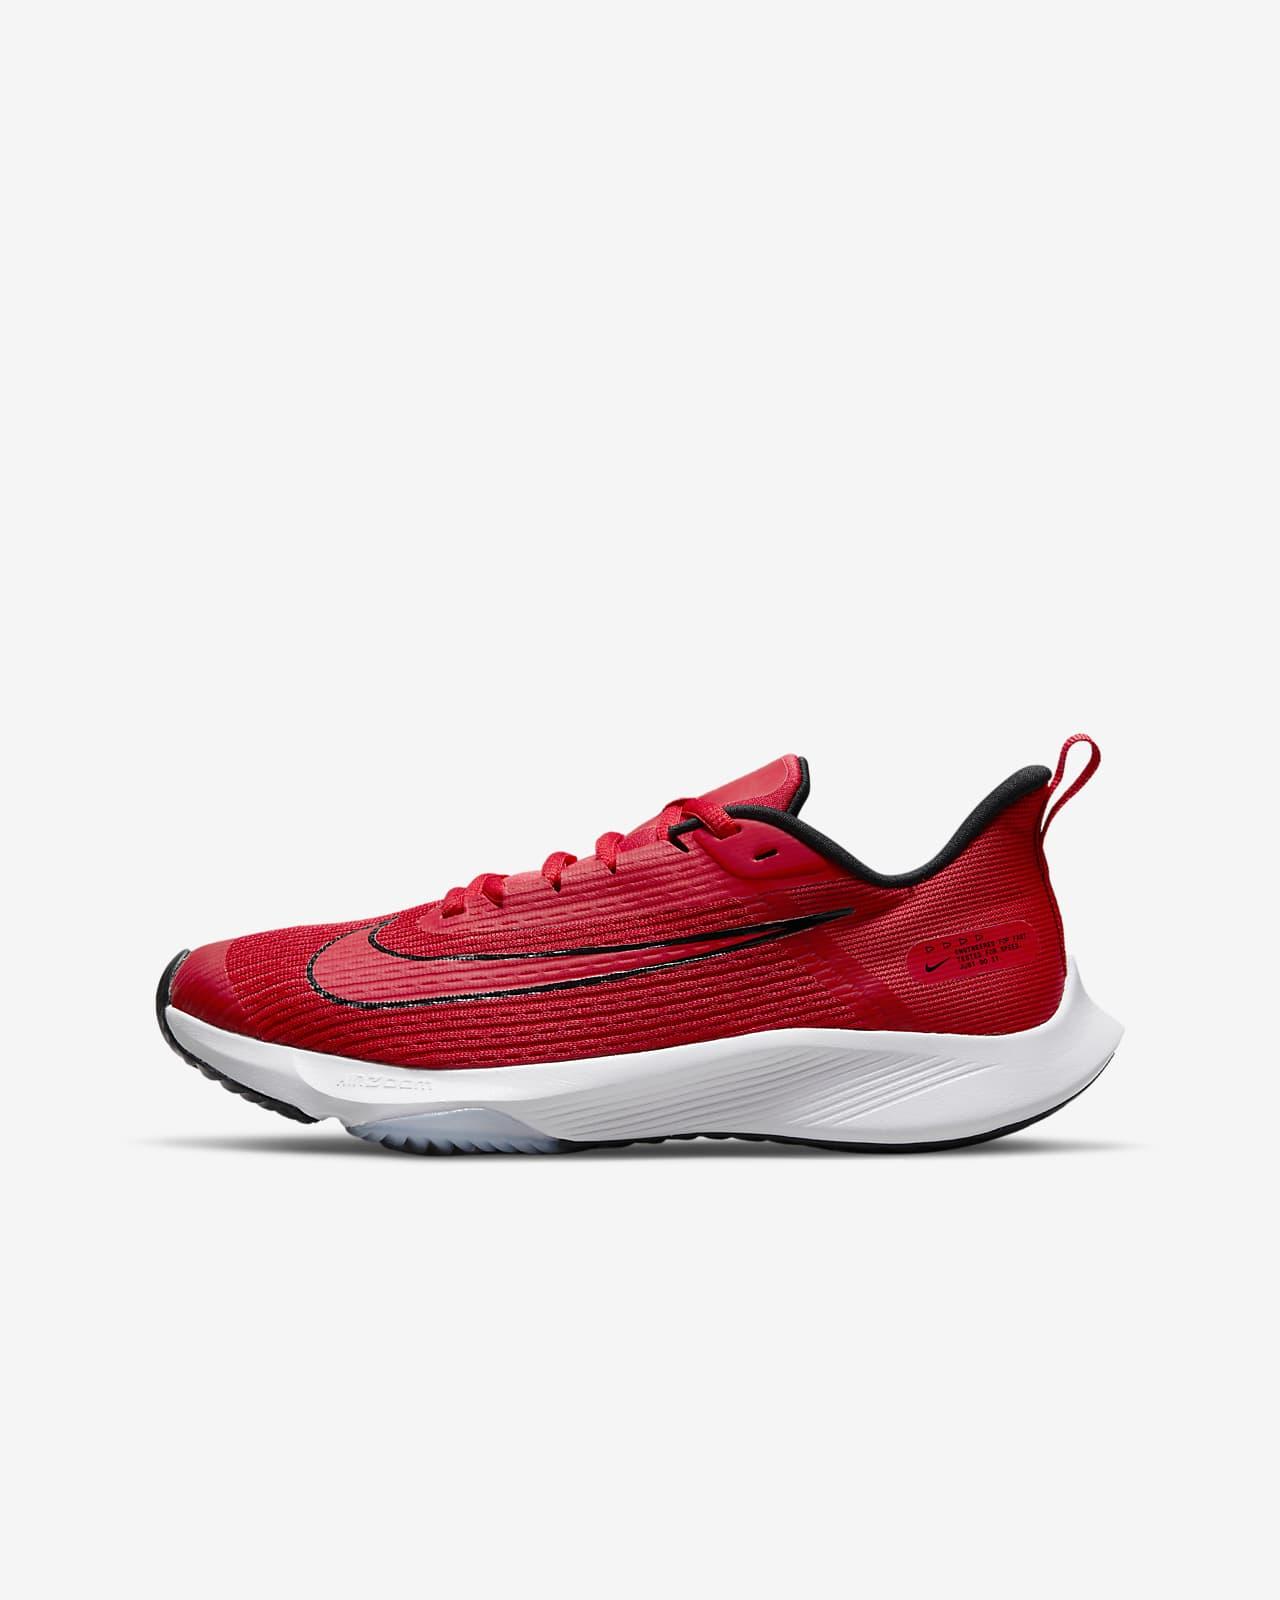 Calzado de running para niños talla pequeña/grande Nike Air Zoom Speed 2